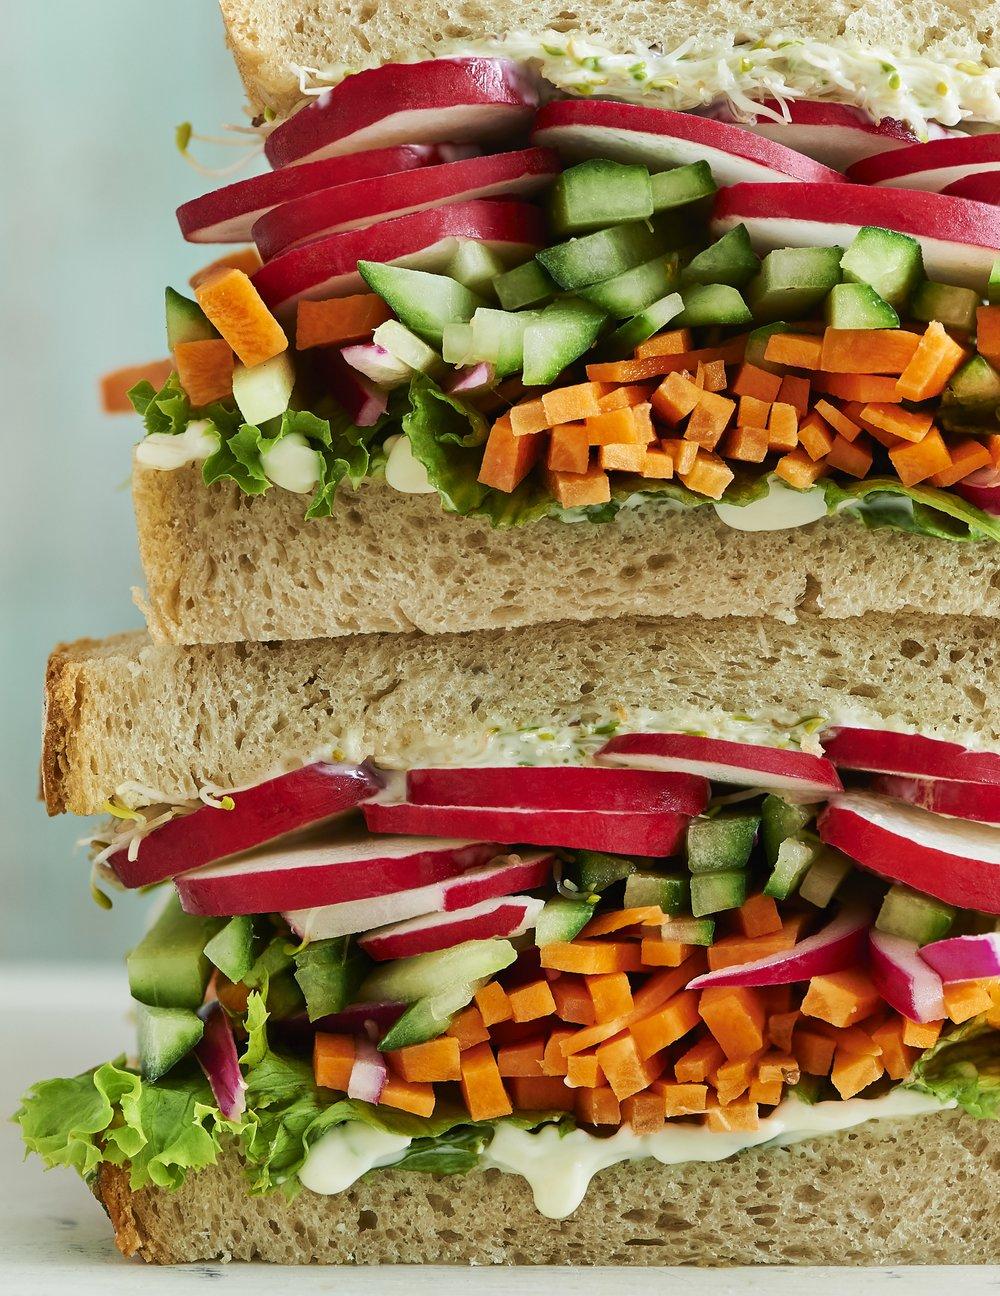 Sandwich+close+up.jpg